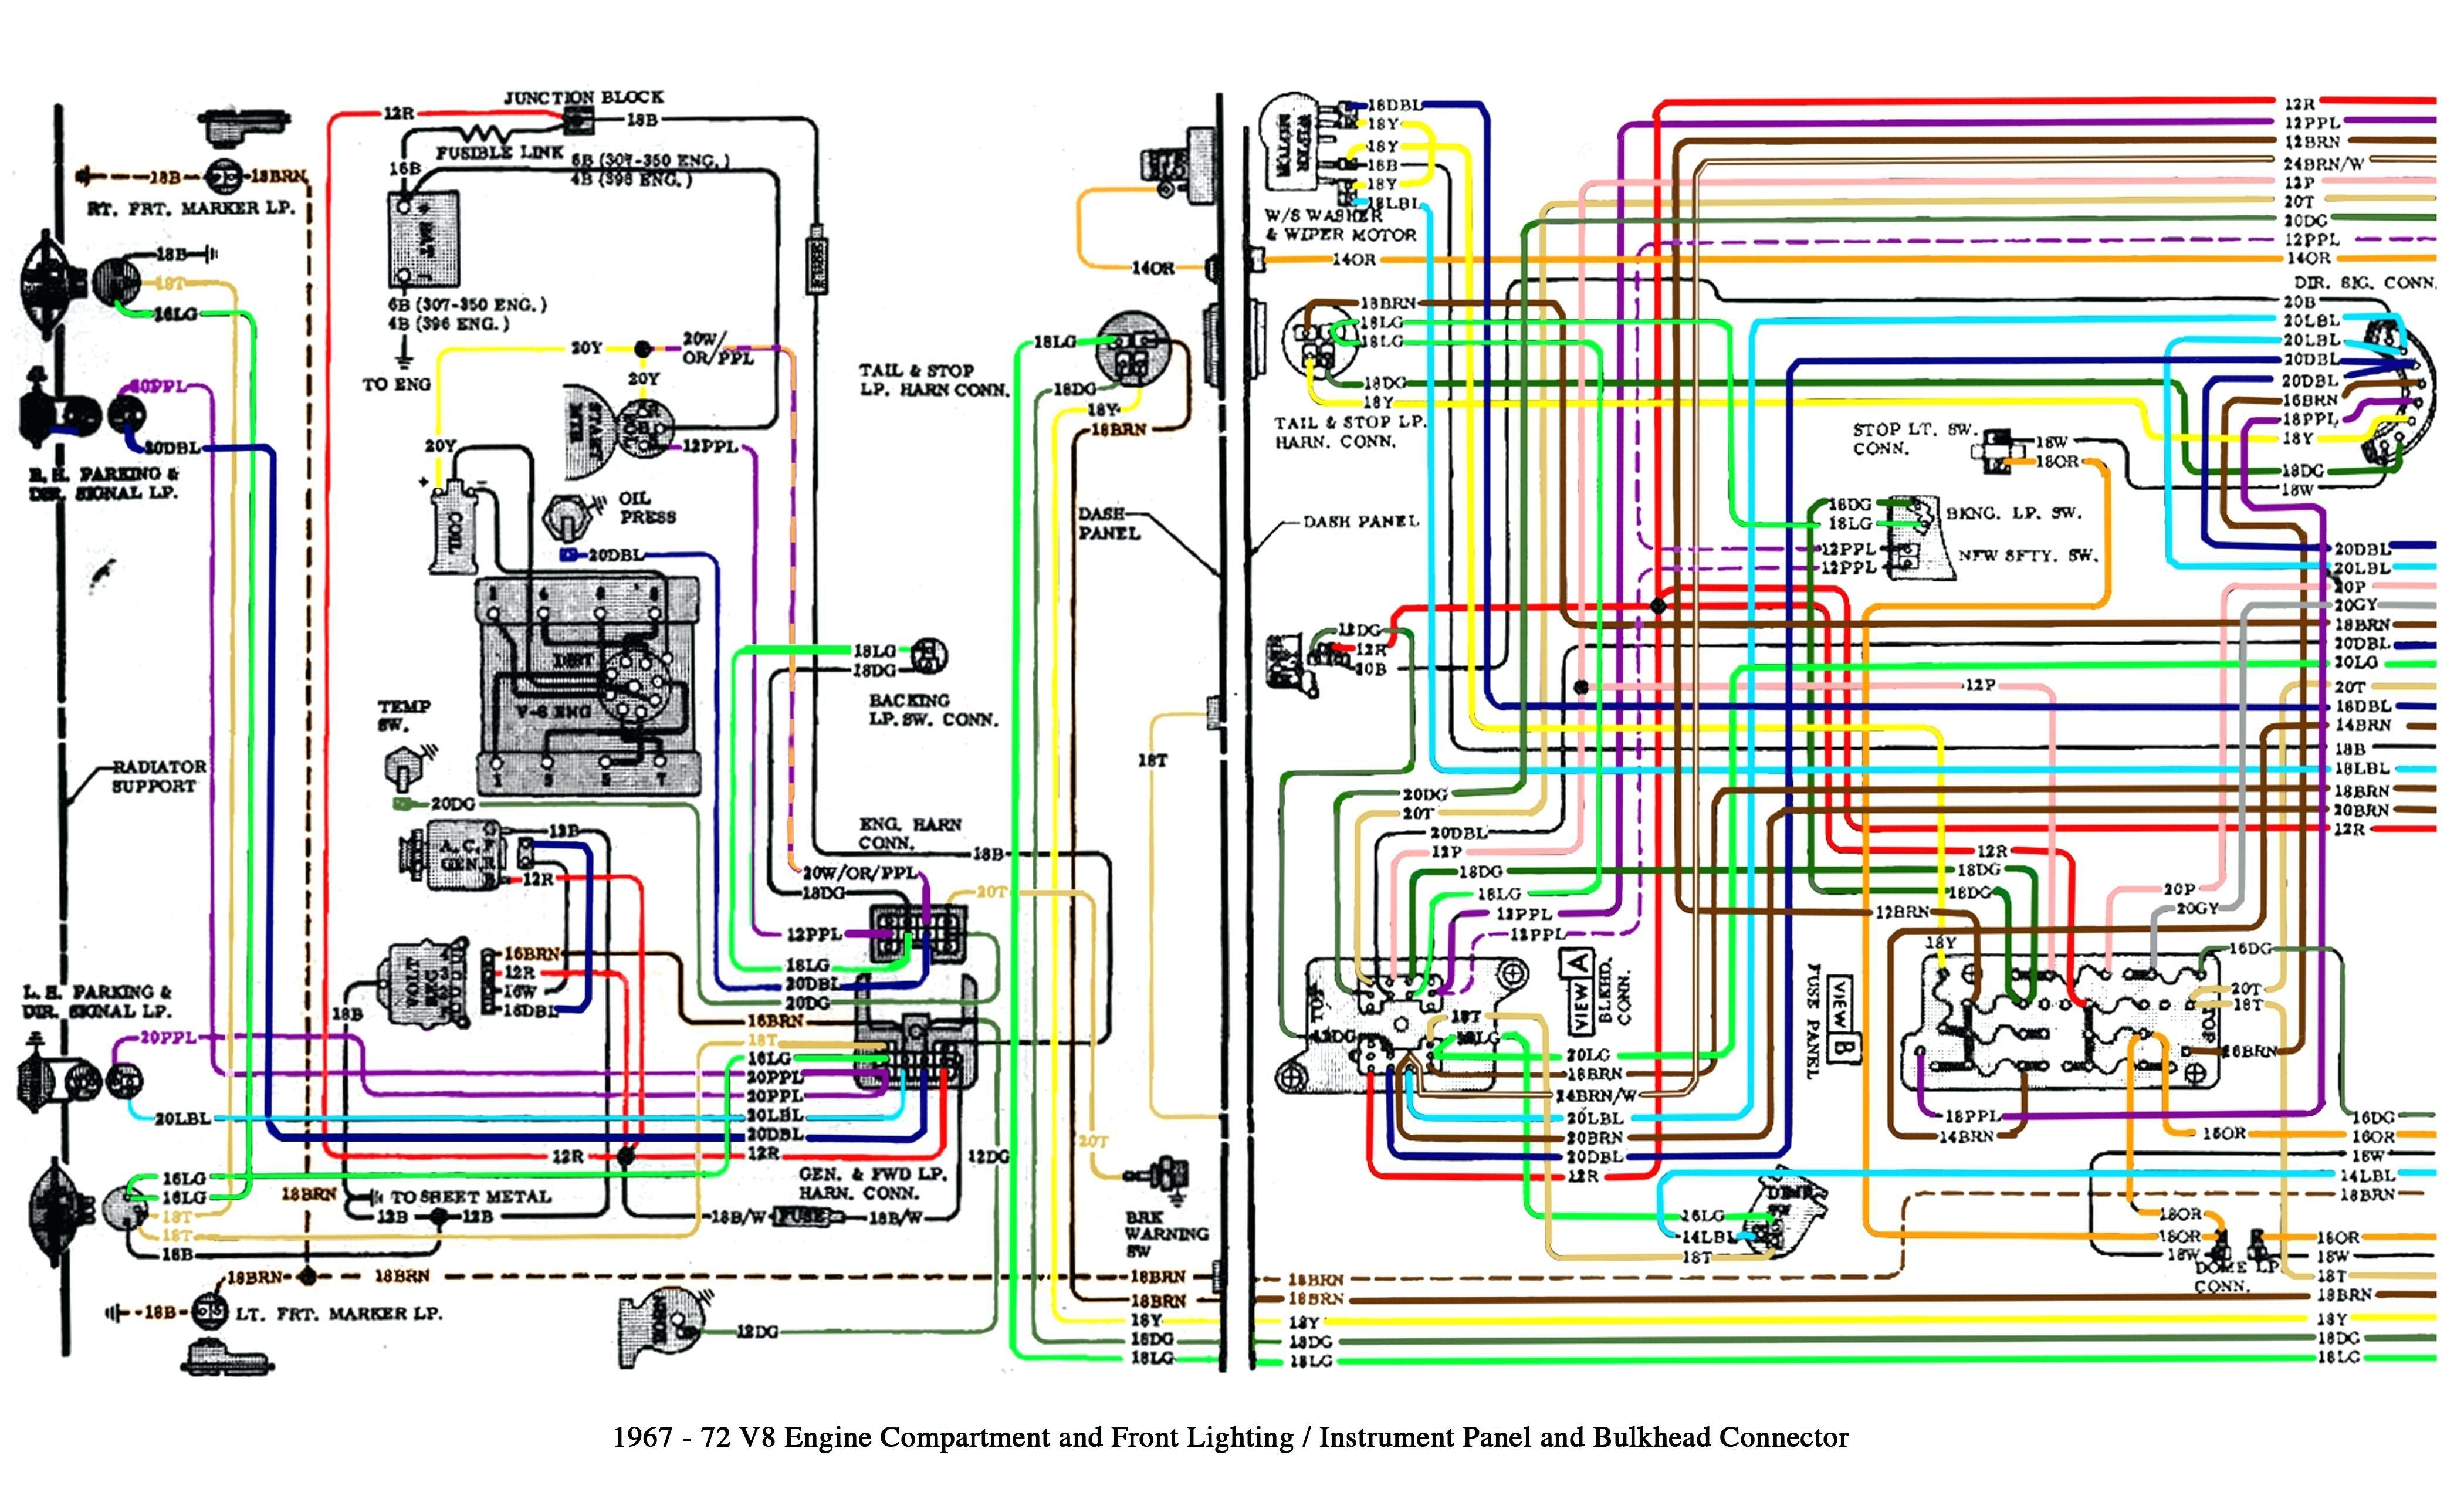 98 S10 Radio Wiring Diagram from i0.wp.com